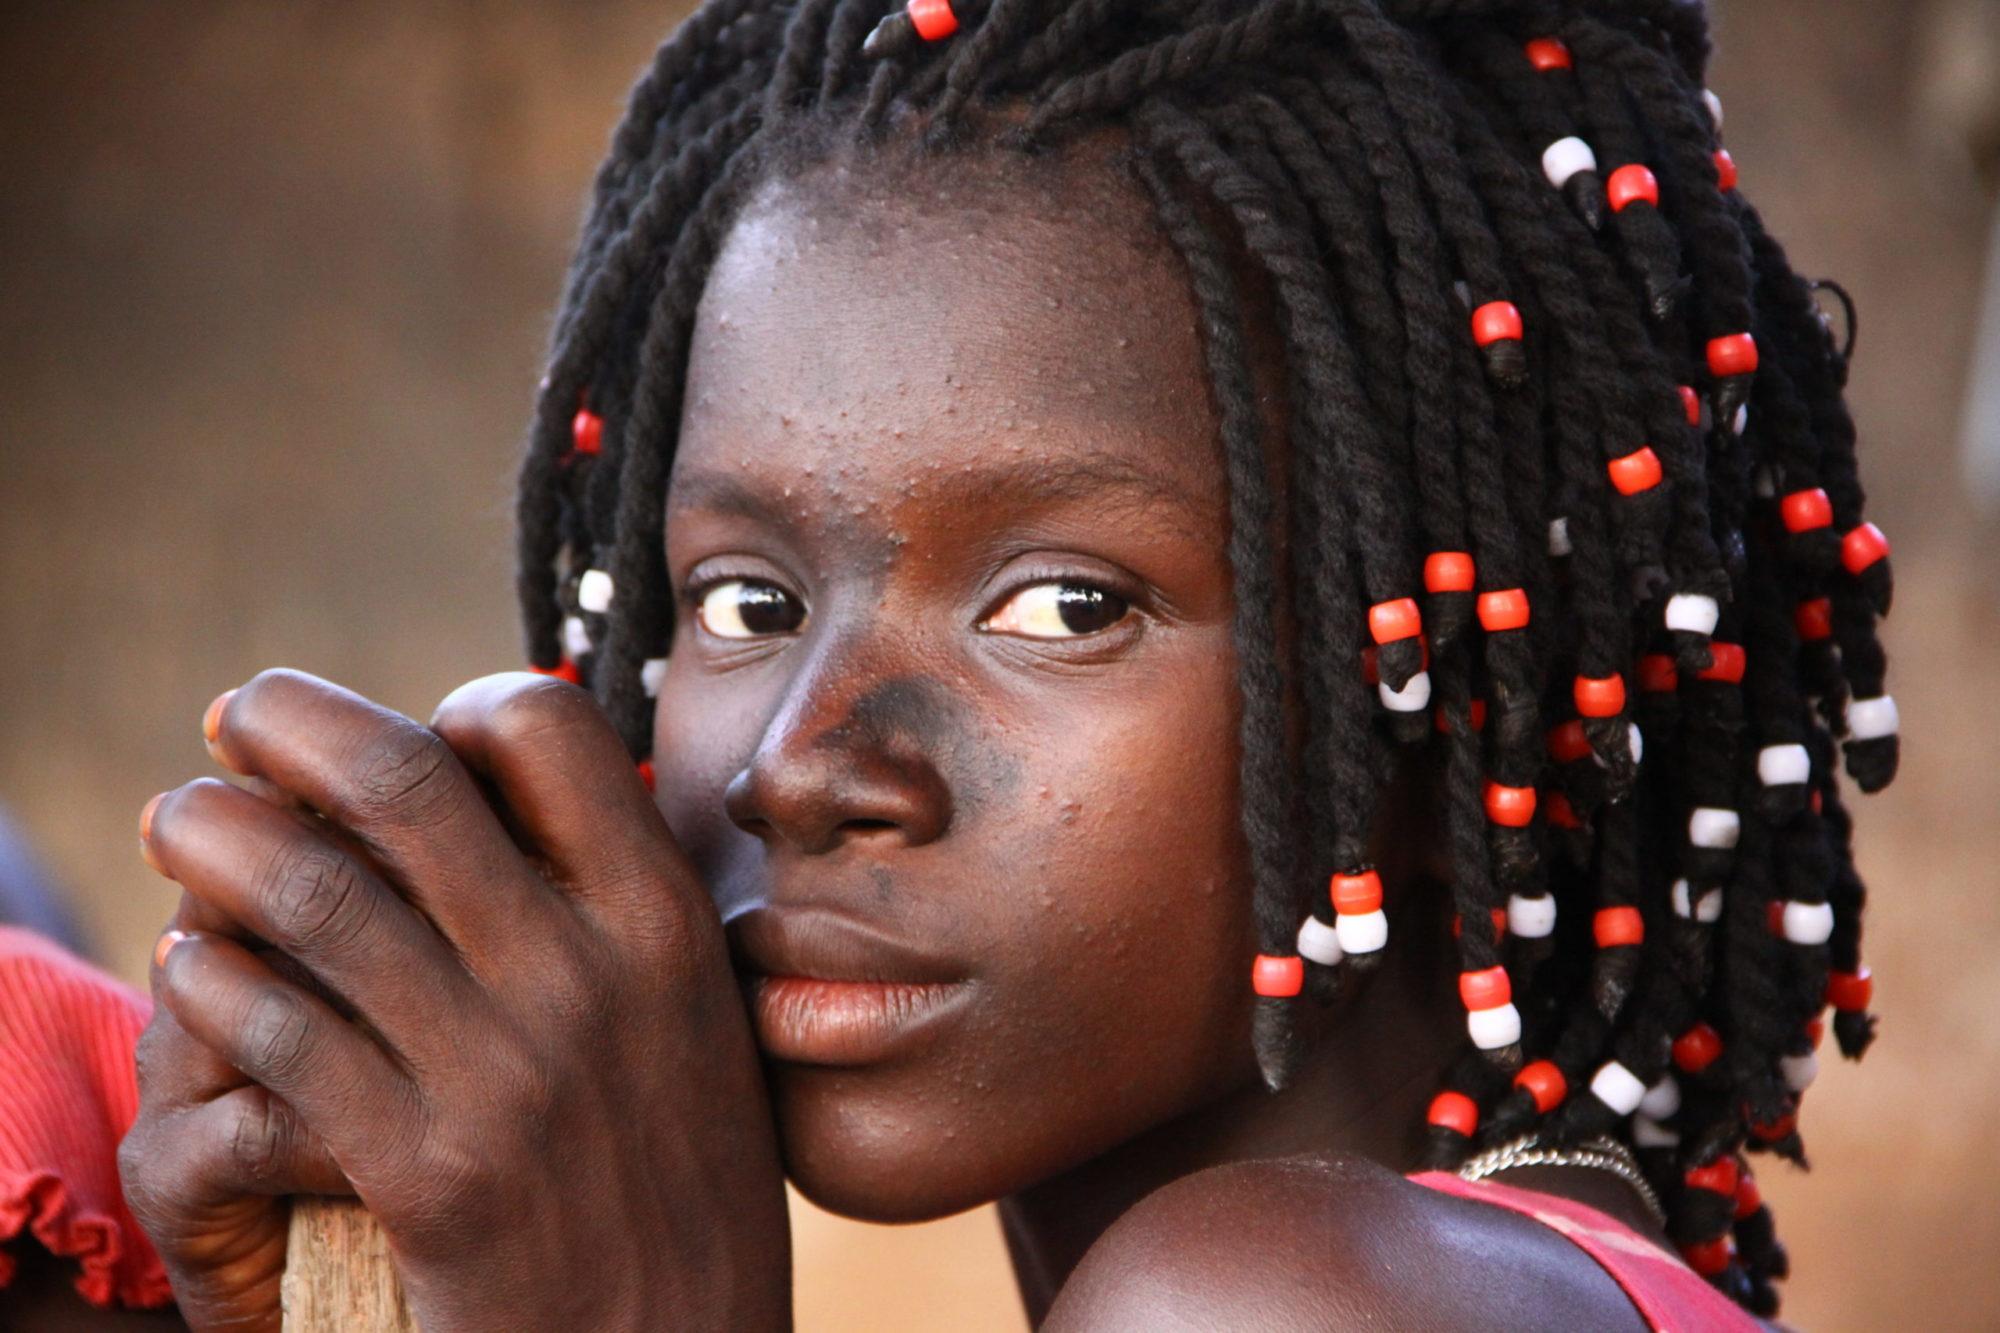 Associazione Amici della Guinea Bissau ONLUS